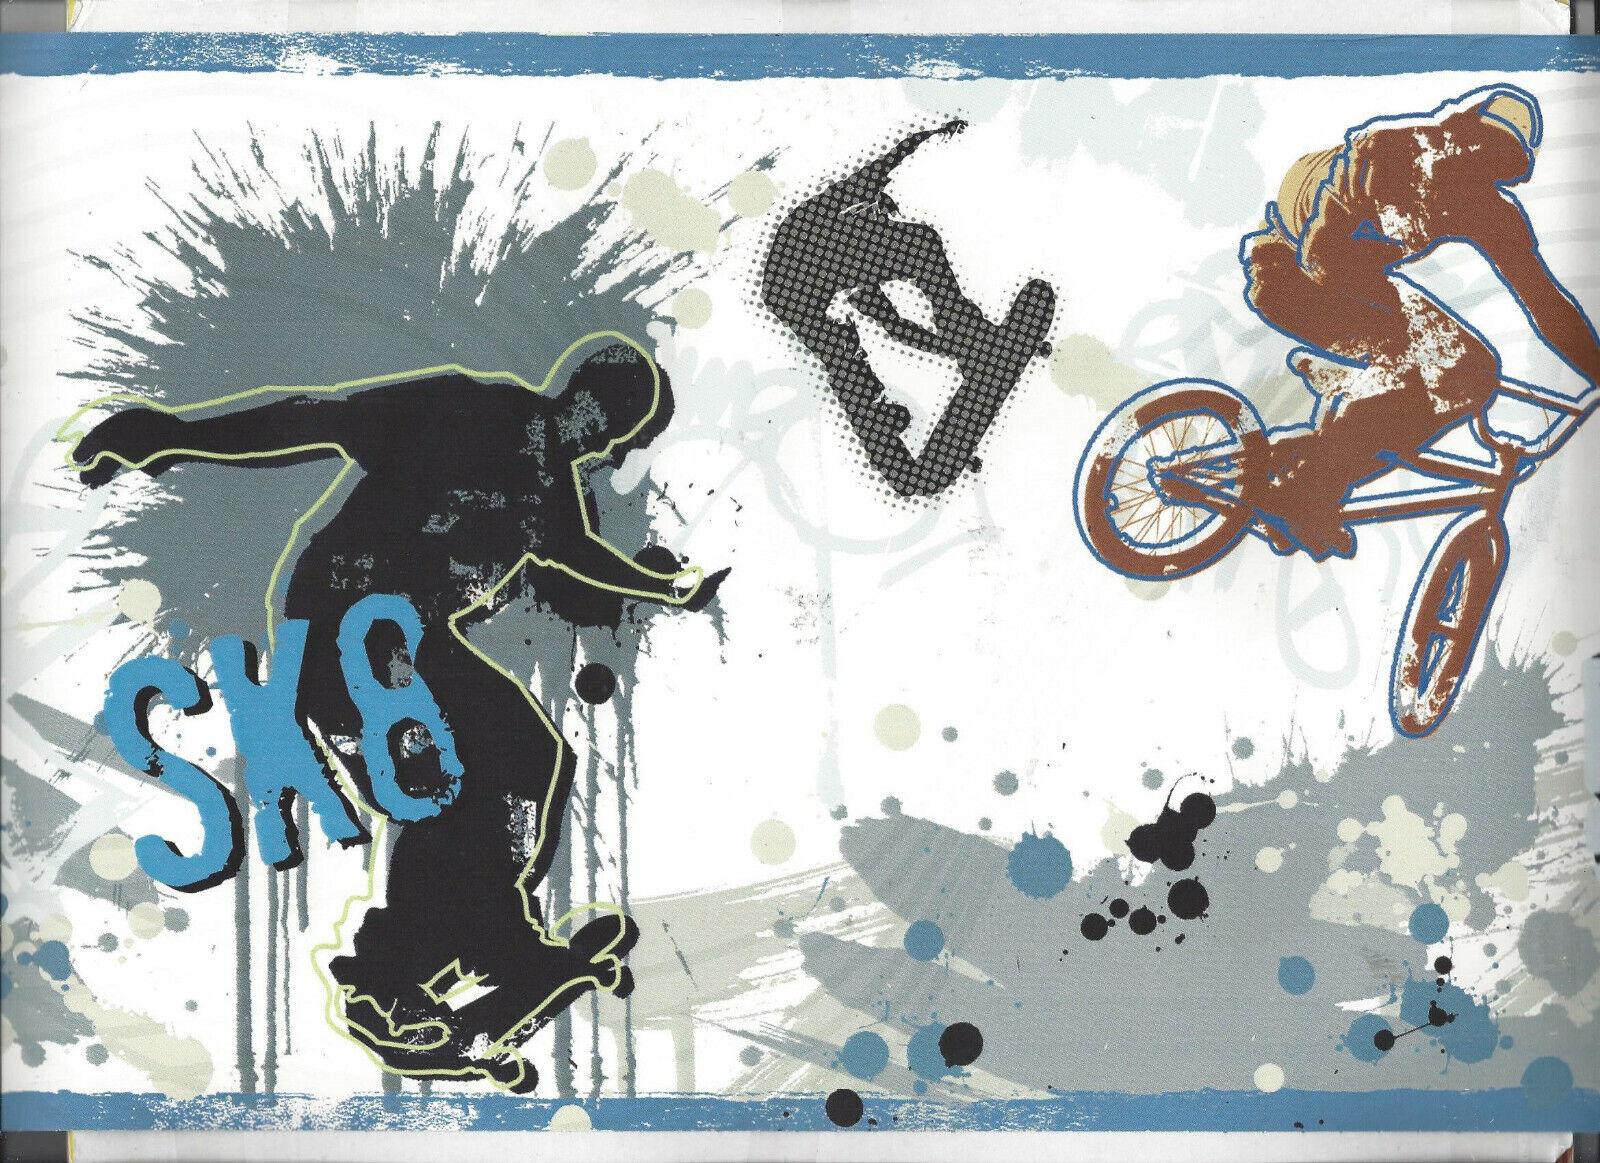 WALLPAPER BORDER SKATEBOARD DIRT BIKE MOTORCYCLE BMX BIKE RACING TEEN SPORTS NEW